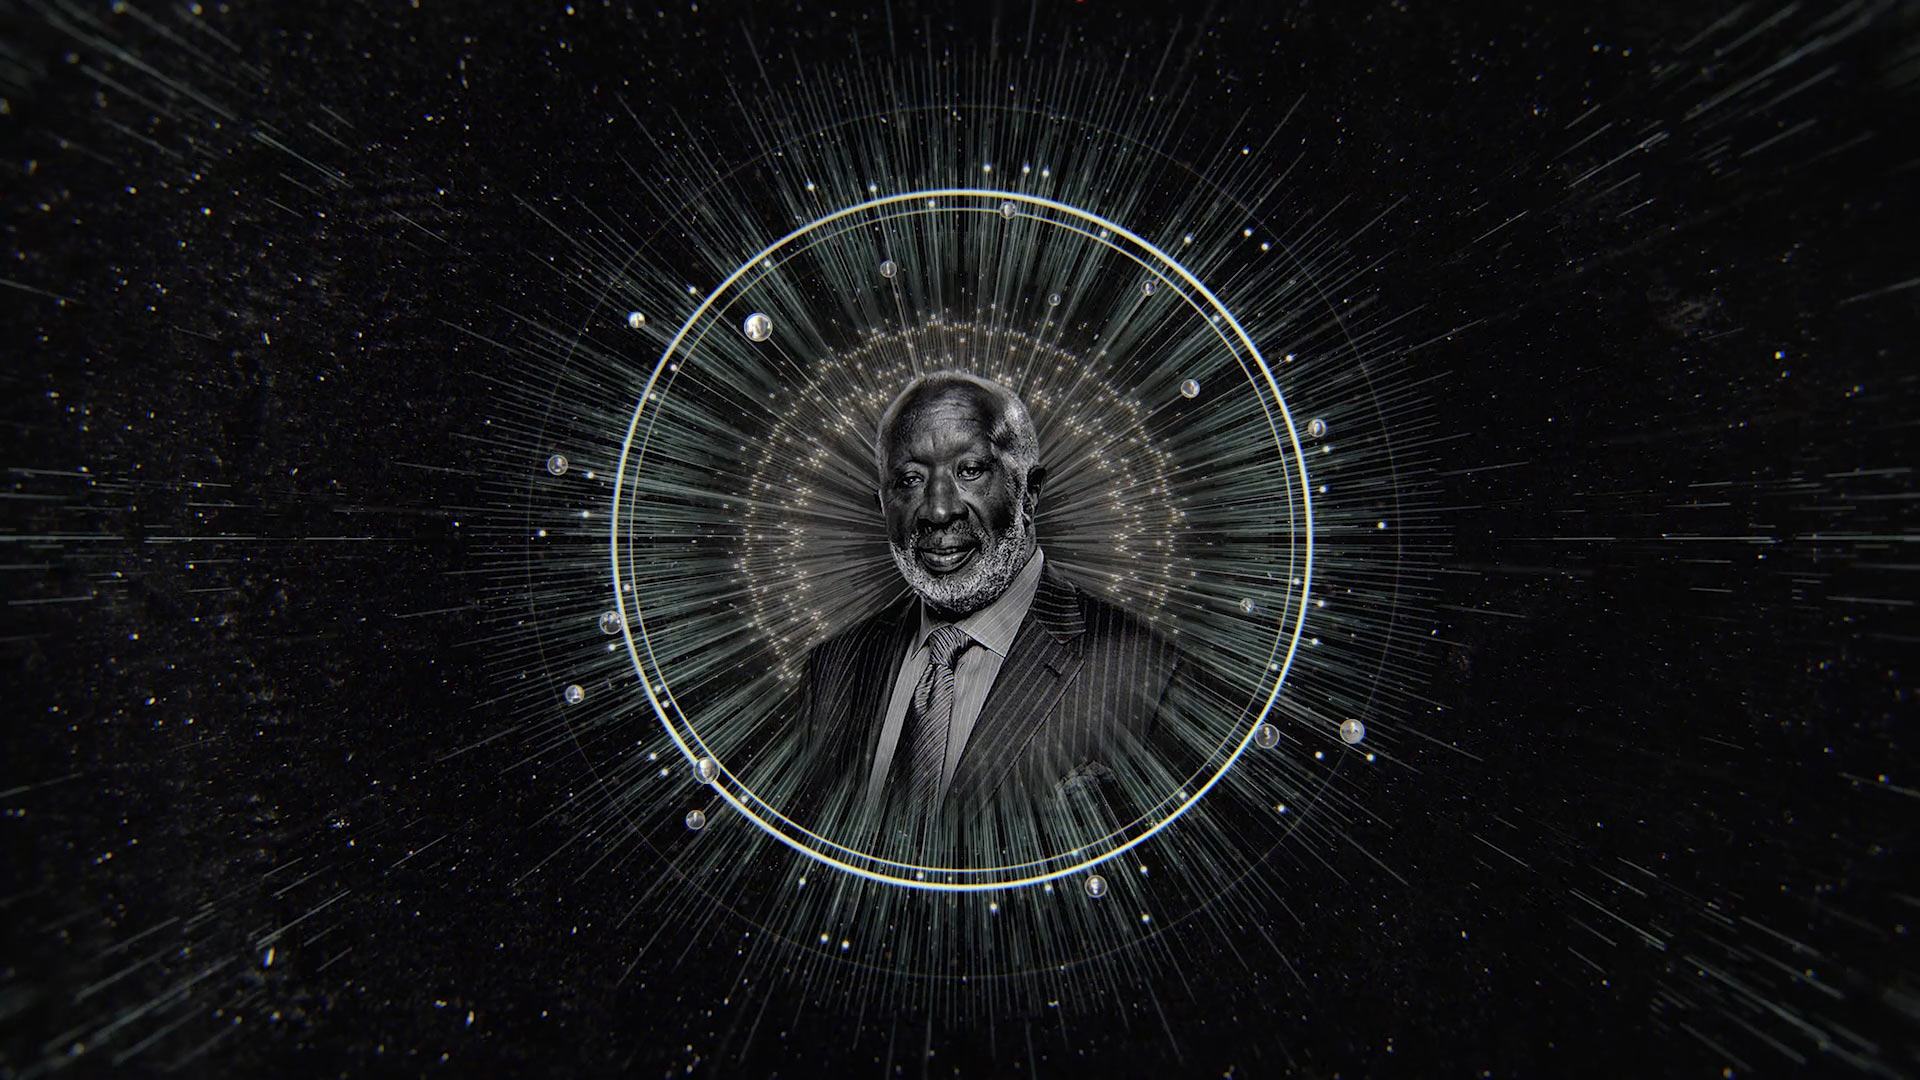 Netflix - The Black Godfather